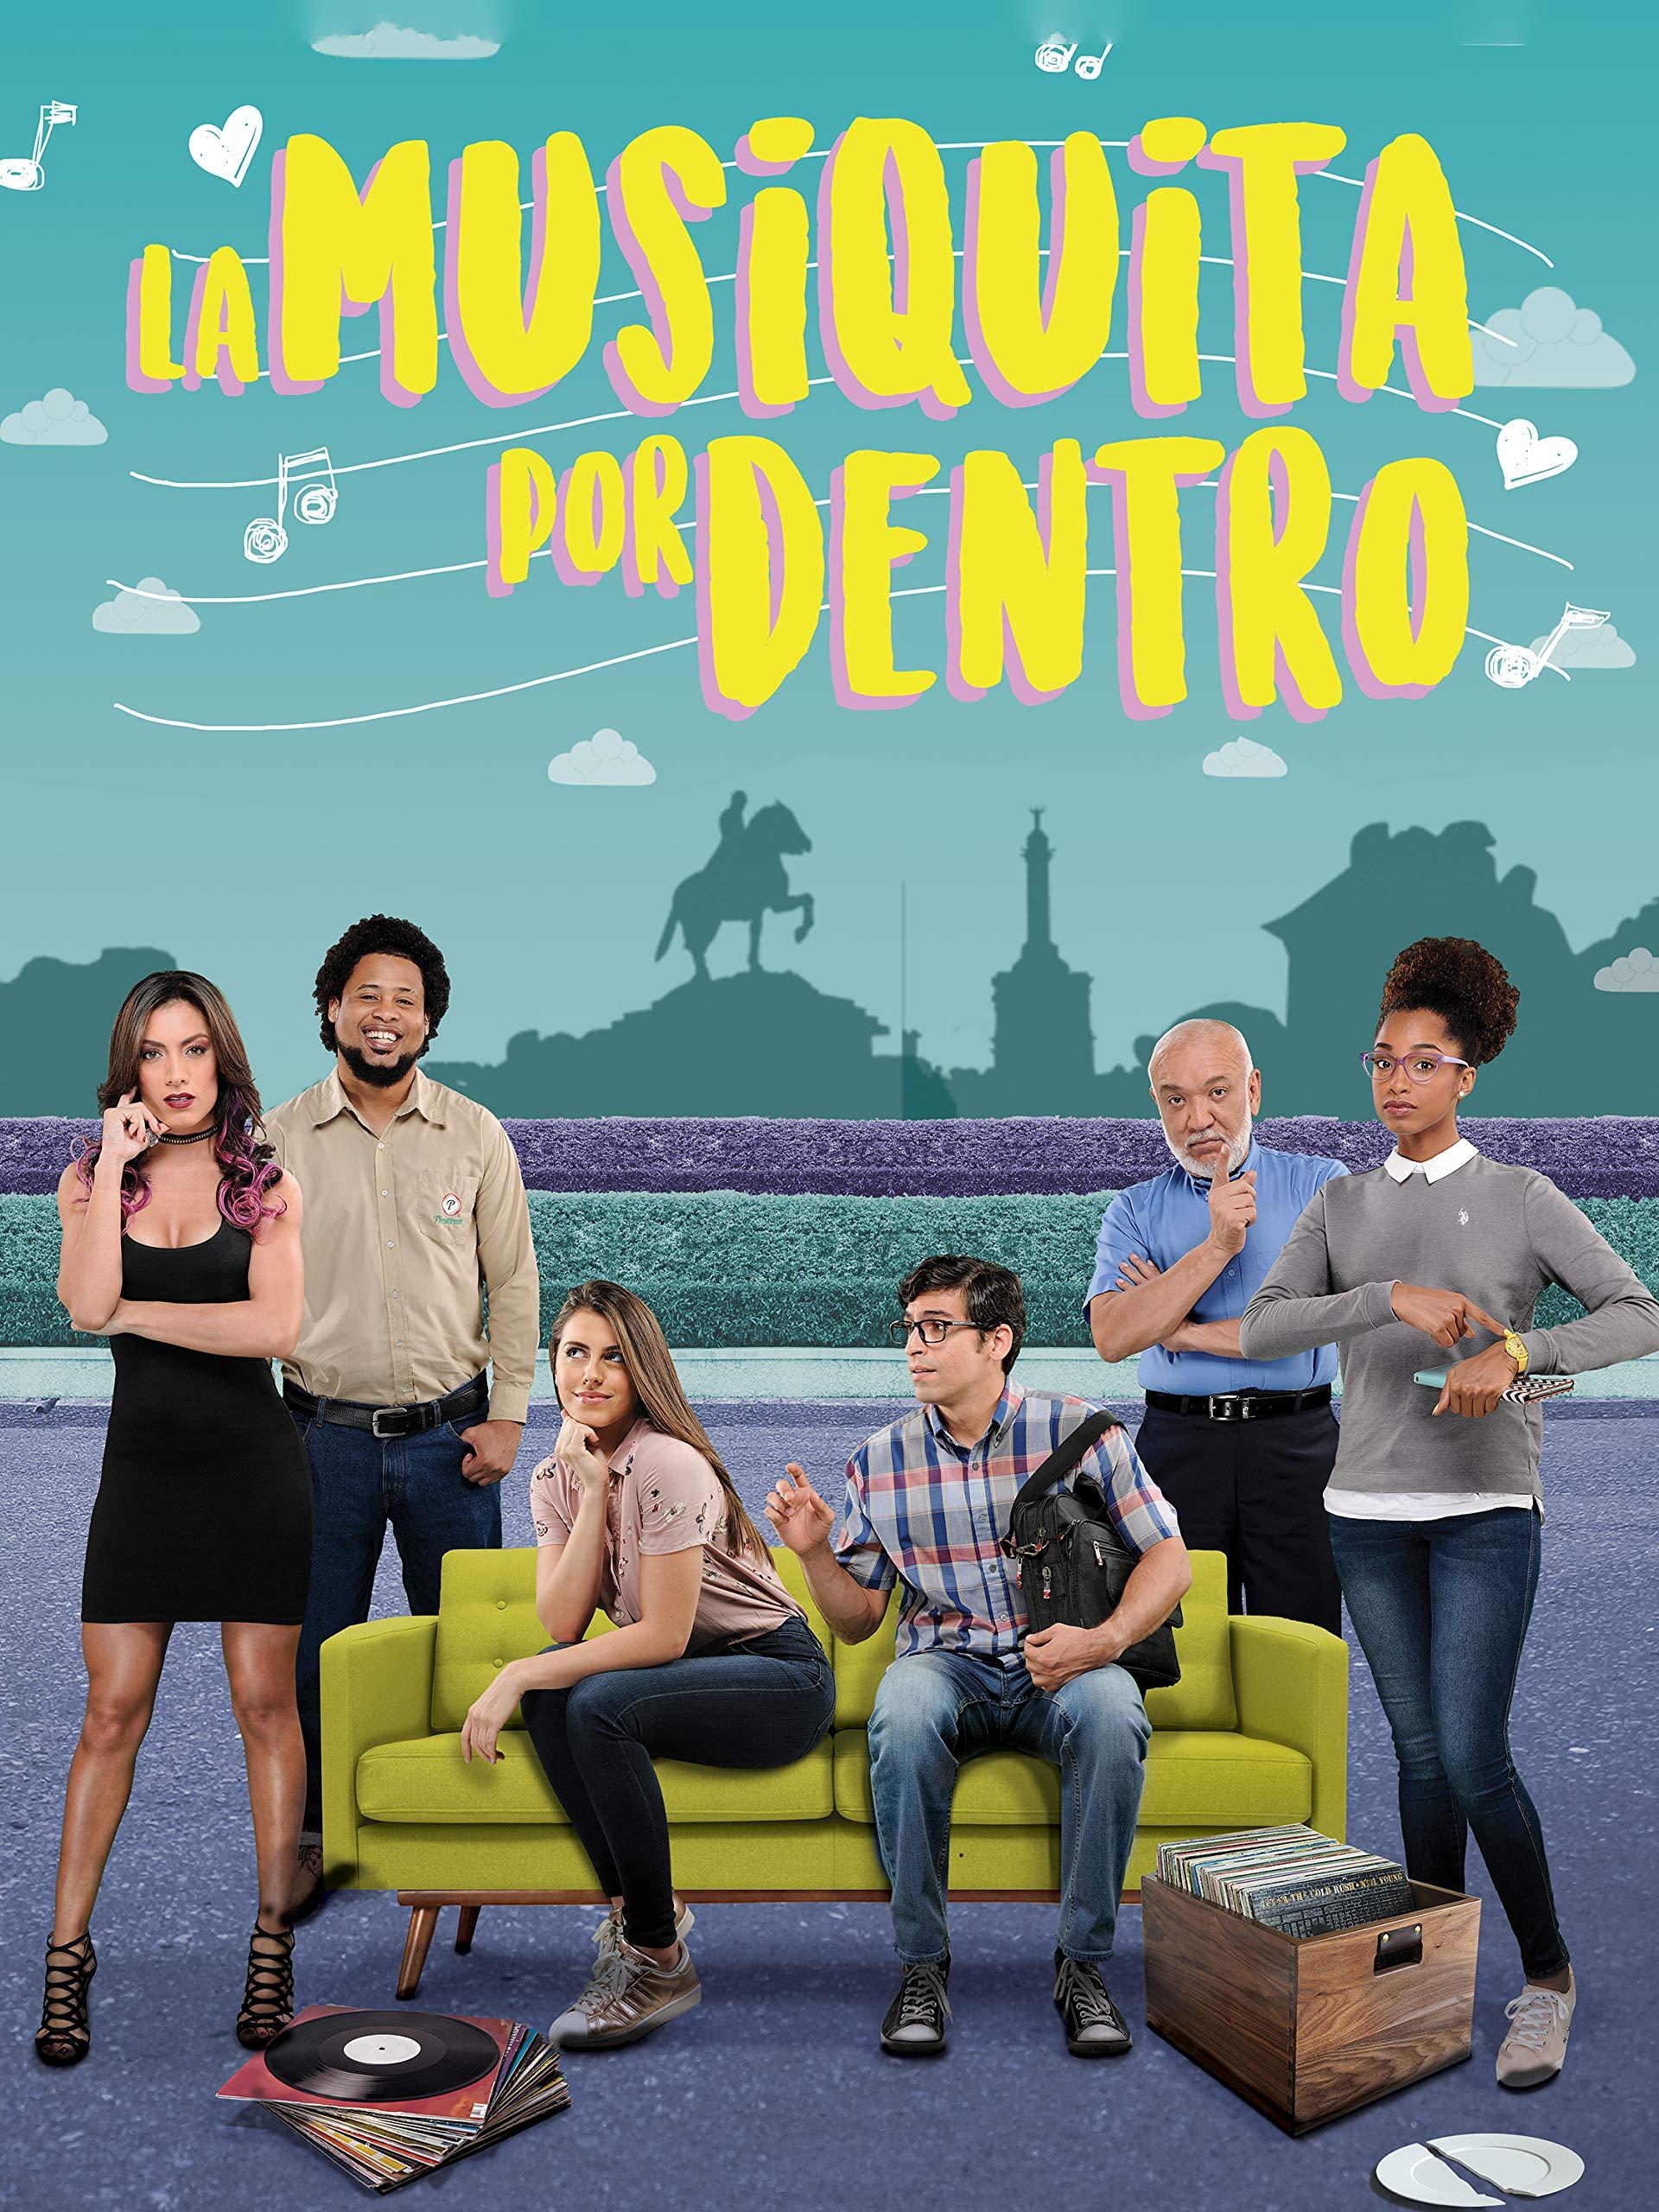 La Musiquita Por Dentro on Amazon Prime Video UK